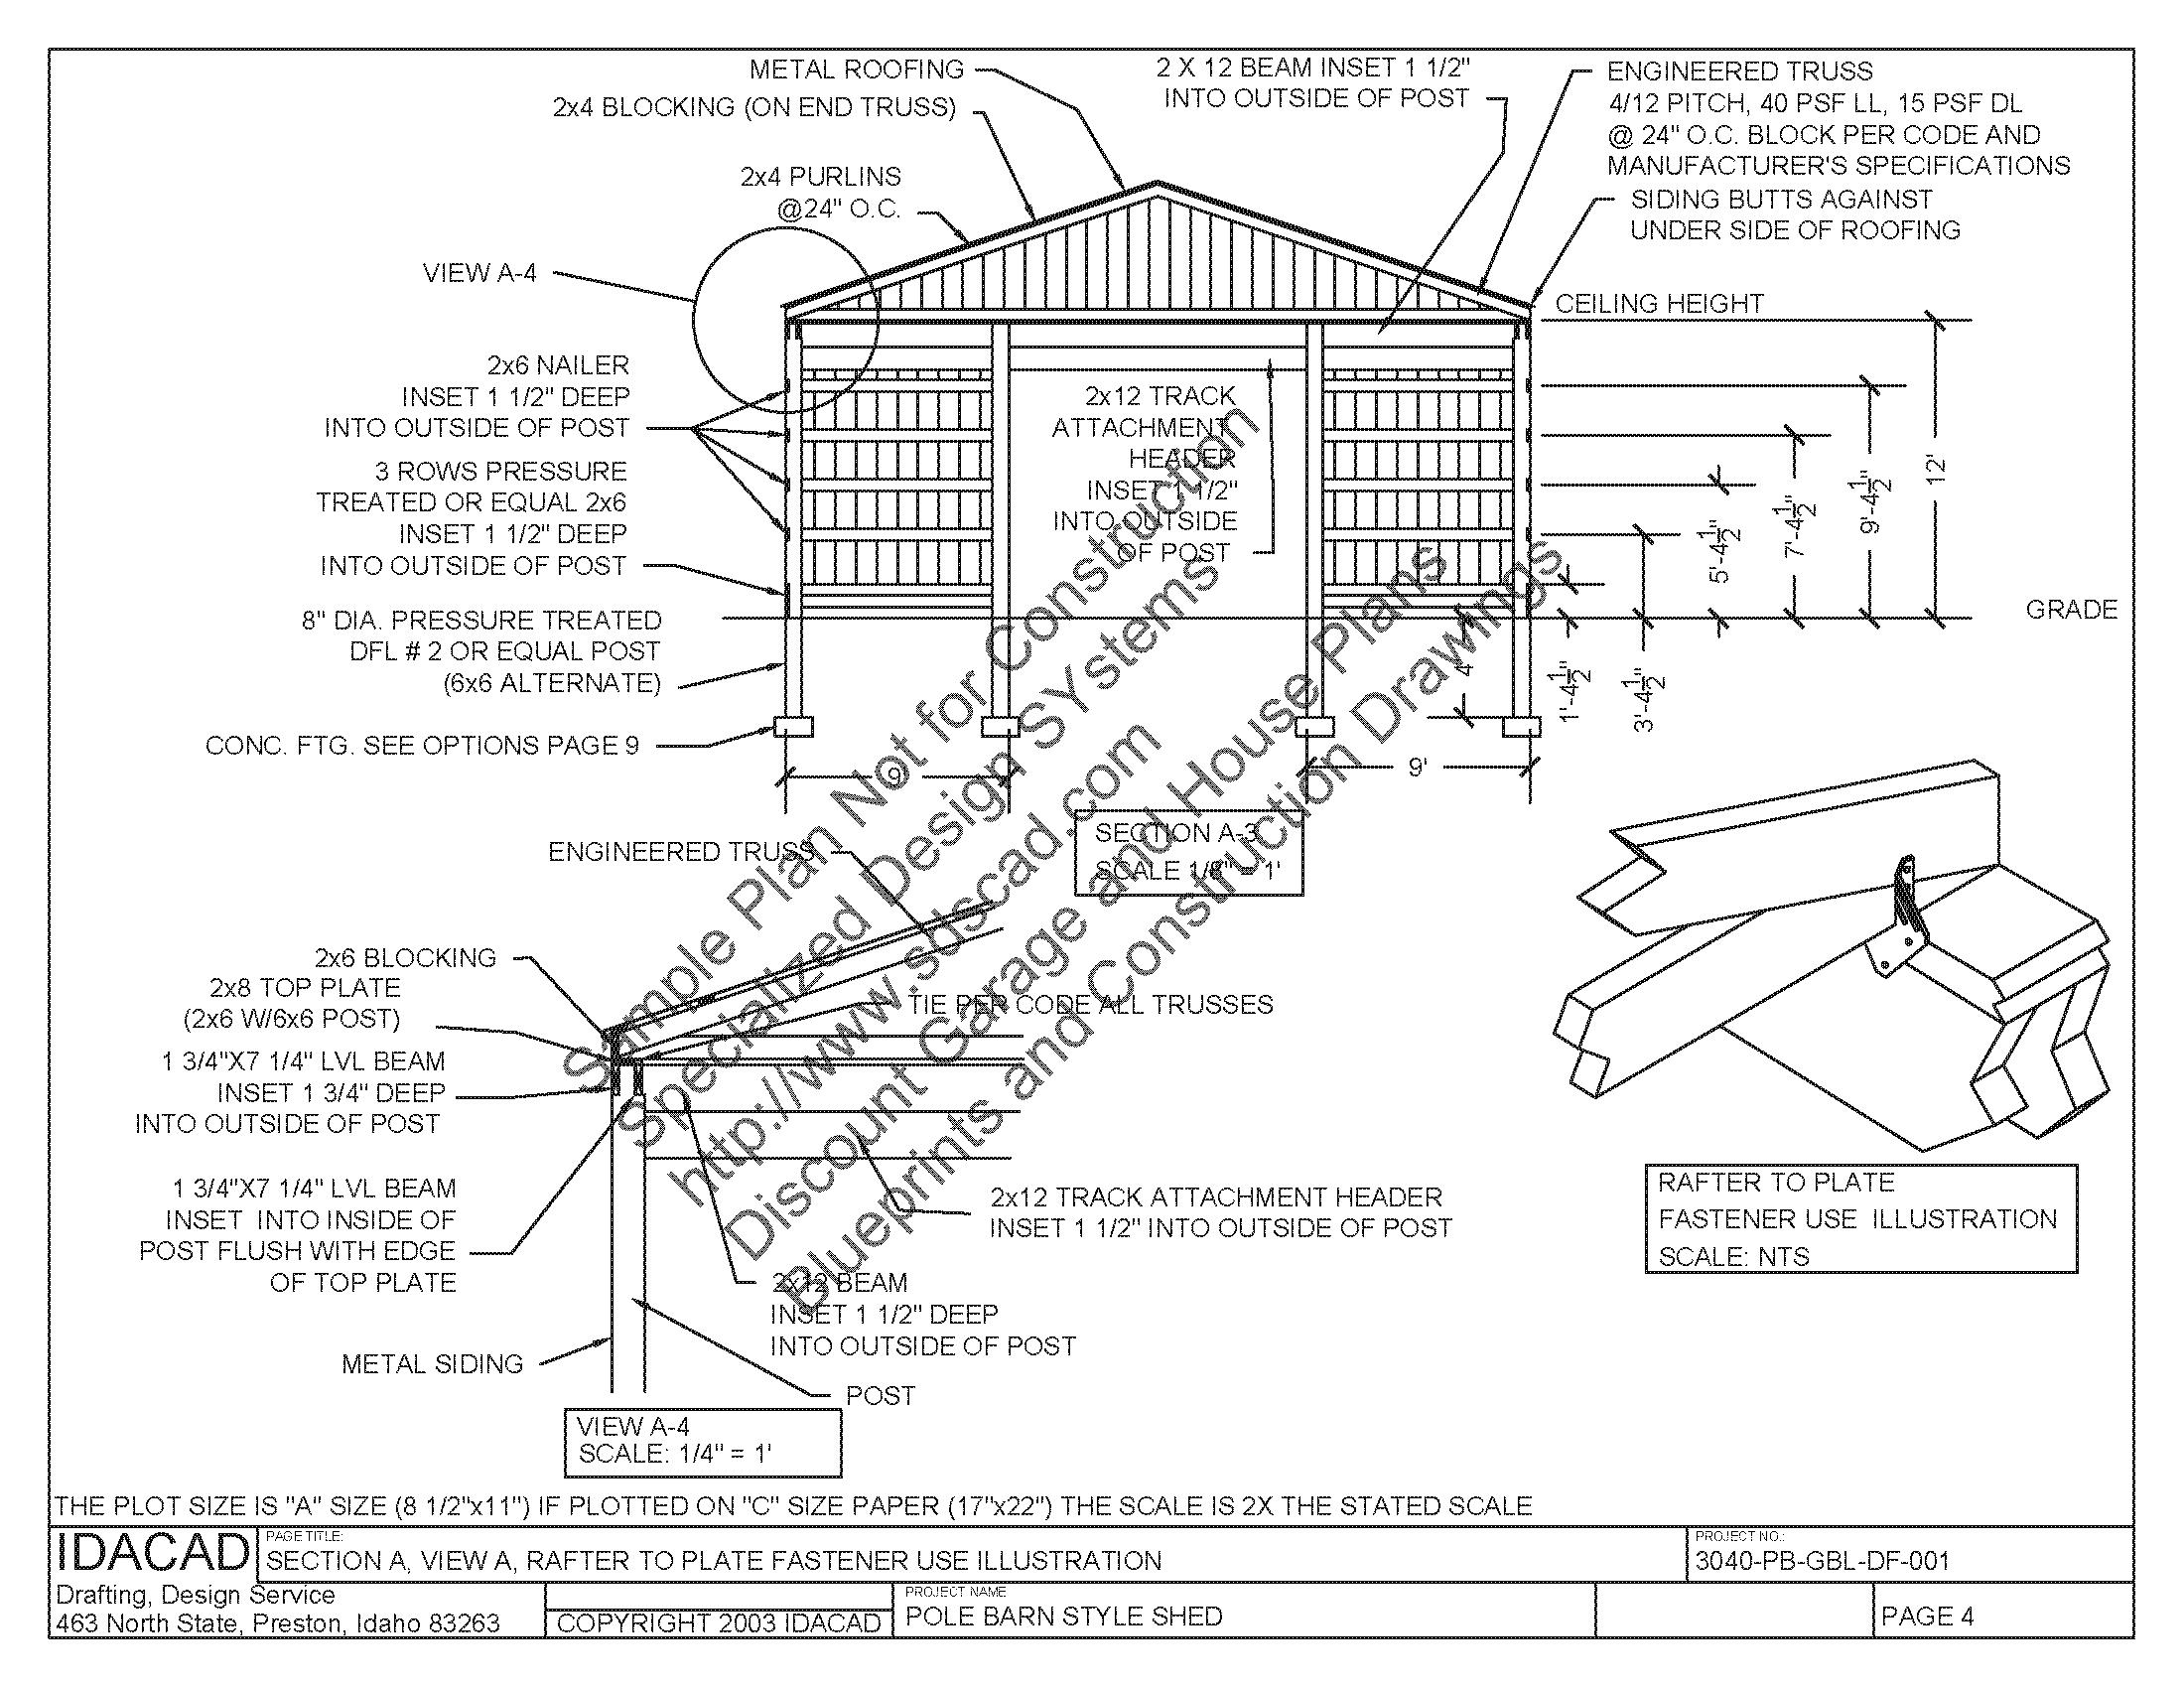 Superb Pole Barns Building Plans #10: PB1 30 X 40 X 12 Pole Barn Plan